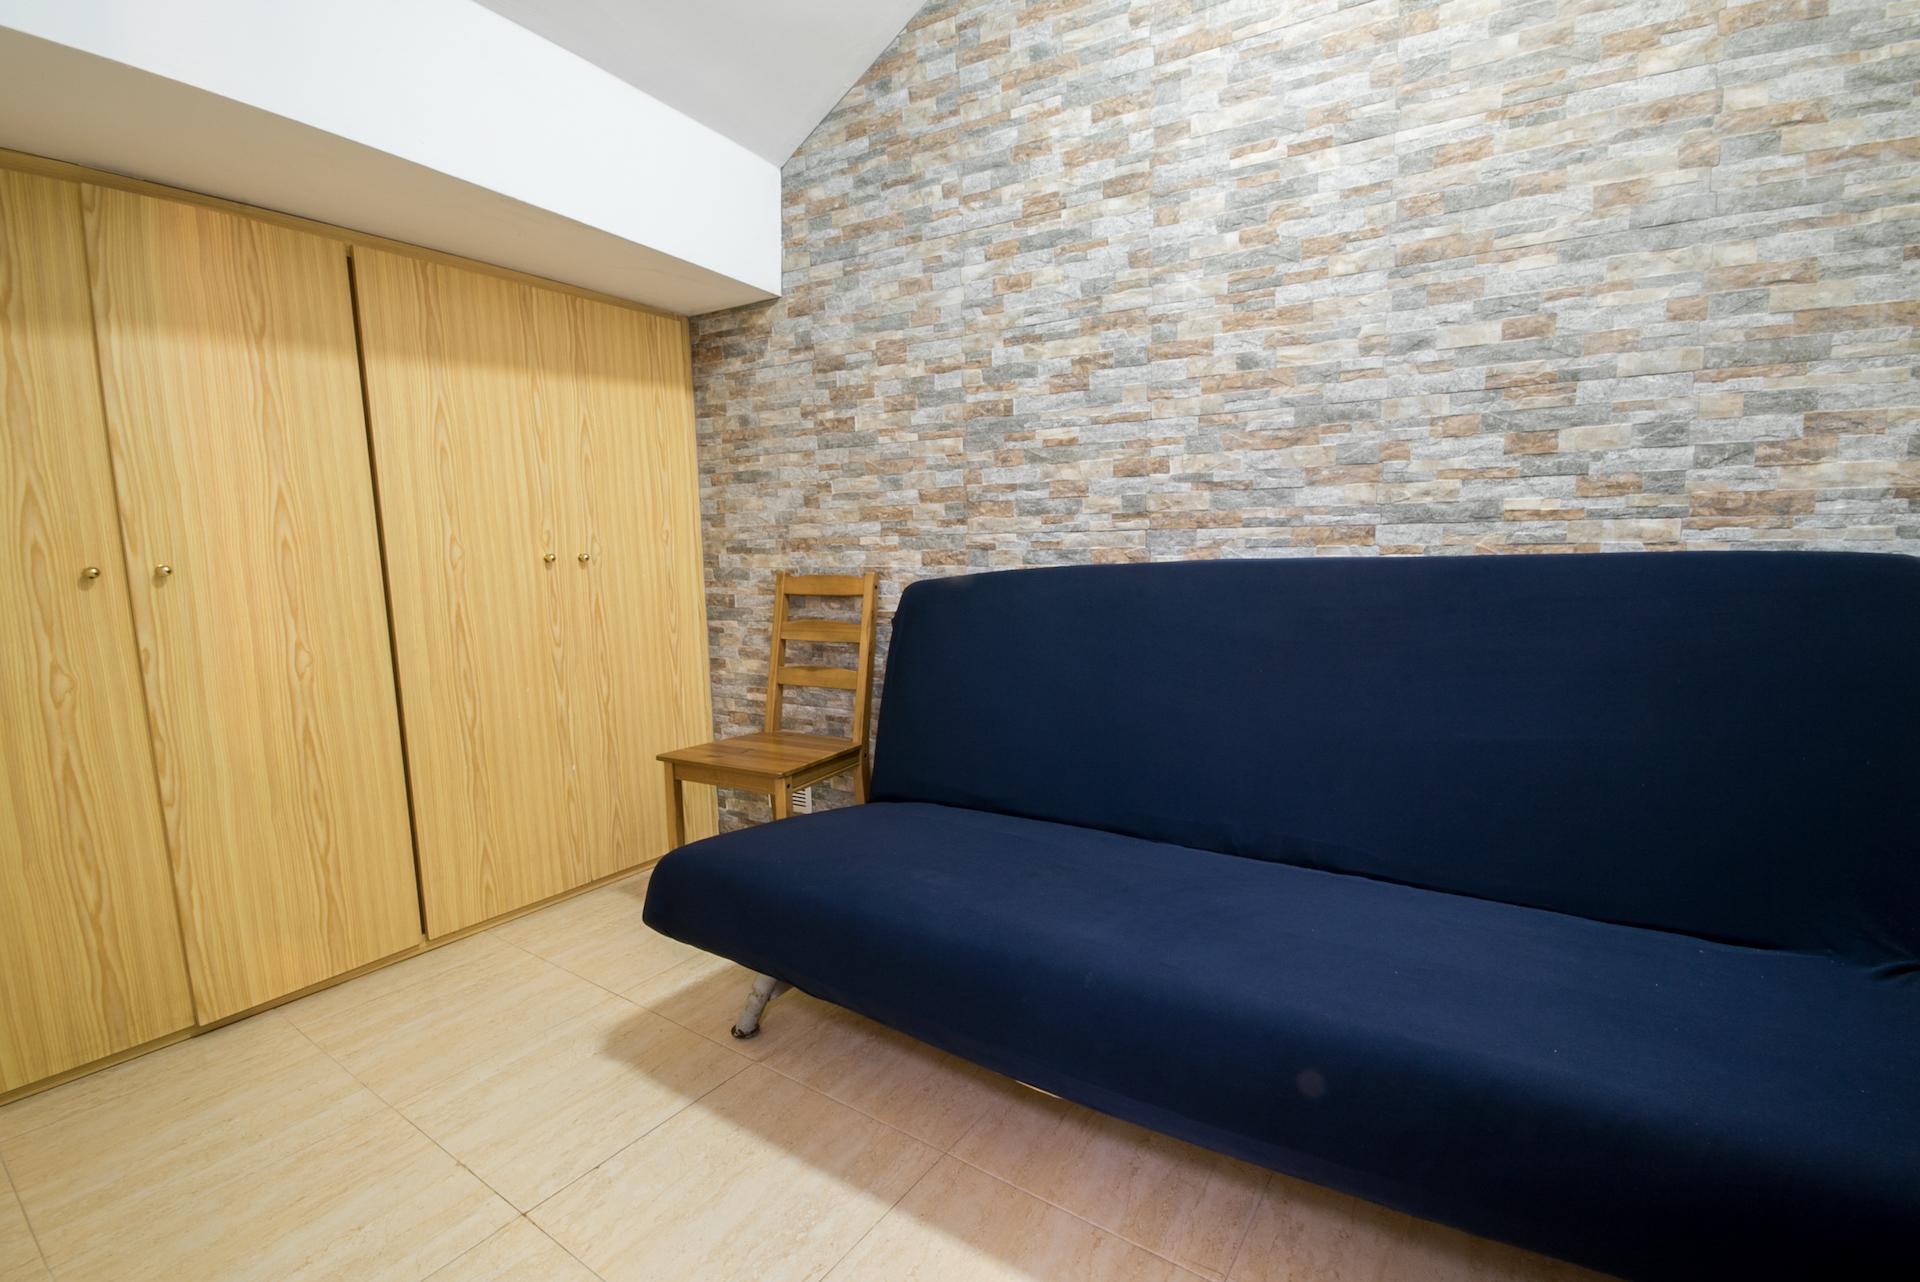 Apartamento Benafer Planta Baja - Salón Sofá-cama